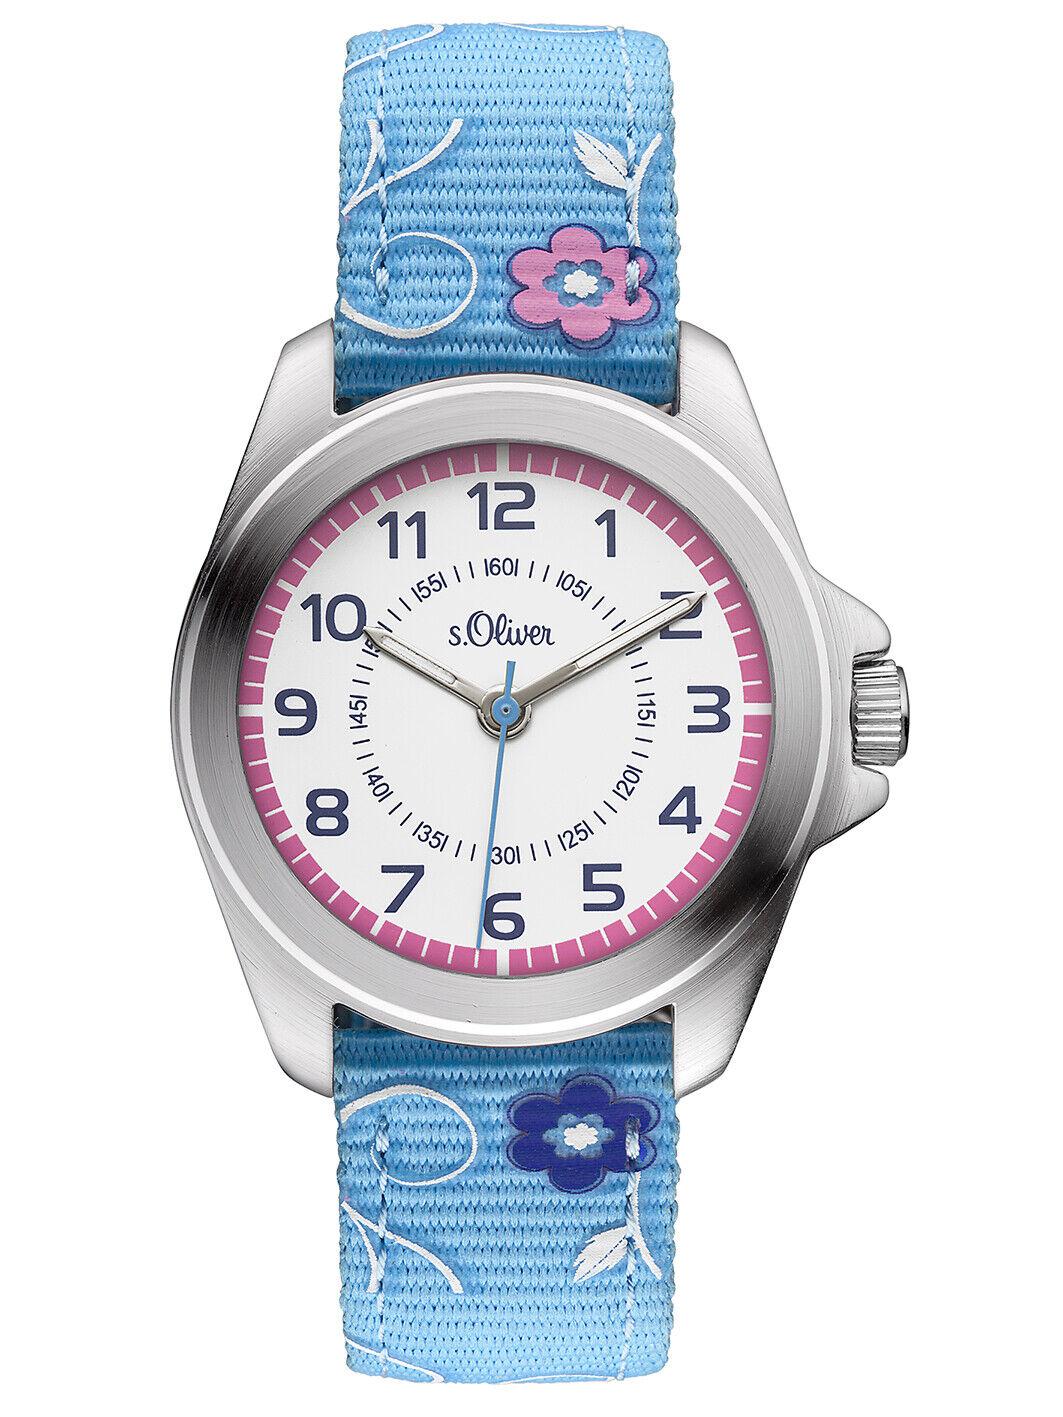 s.Oliver Mädchenuhr Kinder Textil Canvas Armbanduhr Blumen Pink Blau SO-3176-LQ